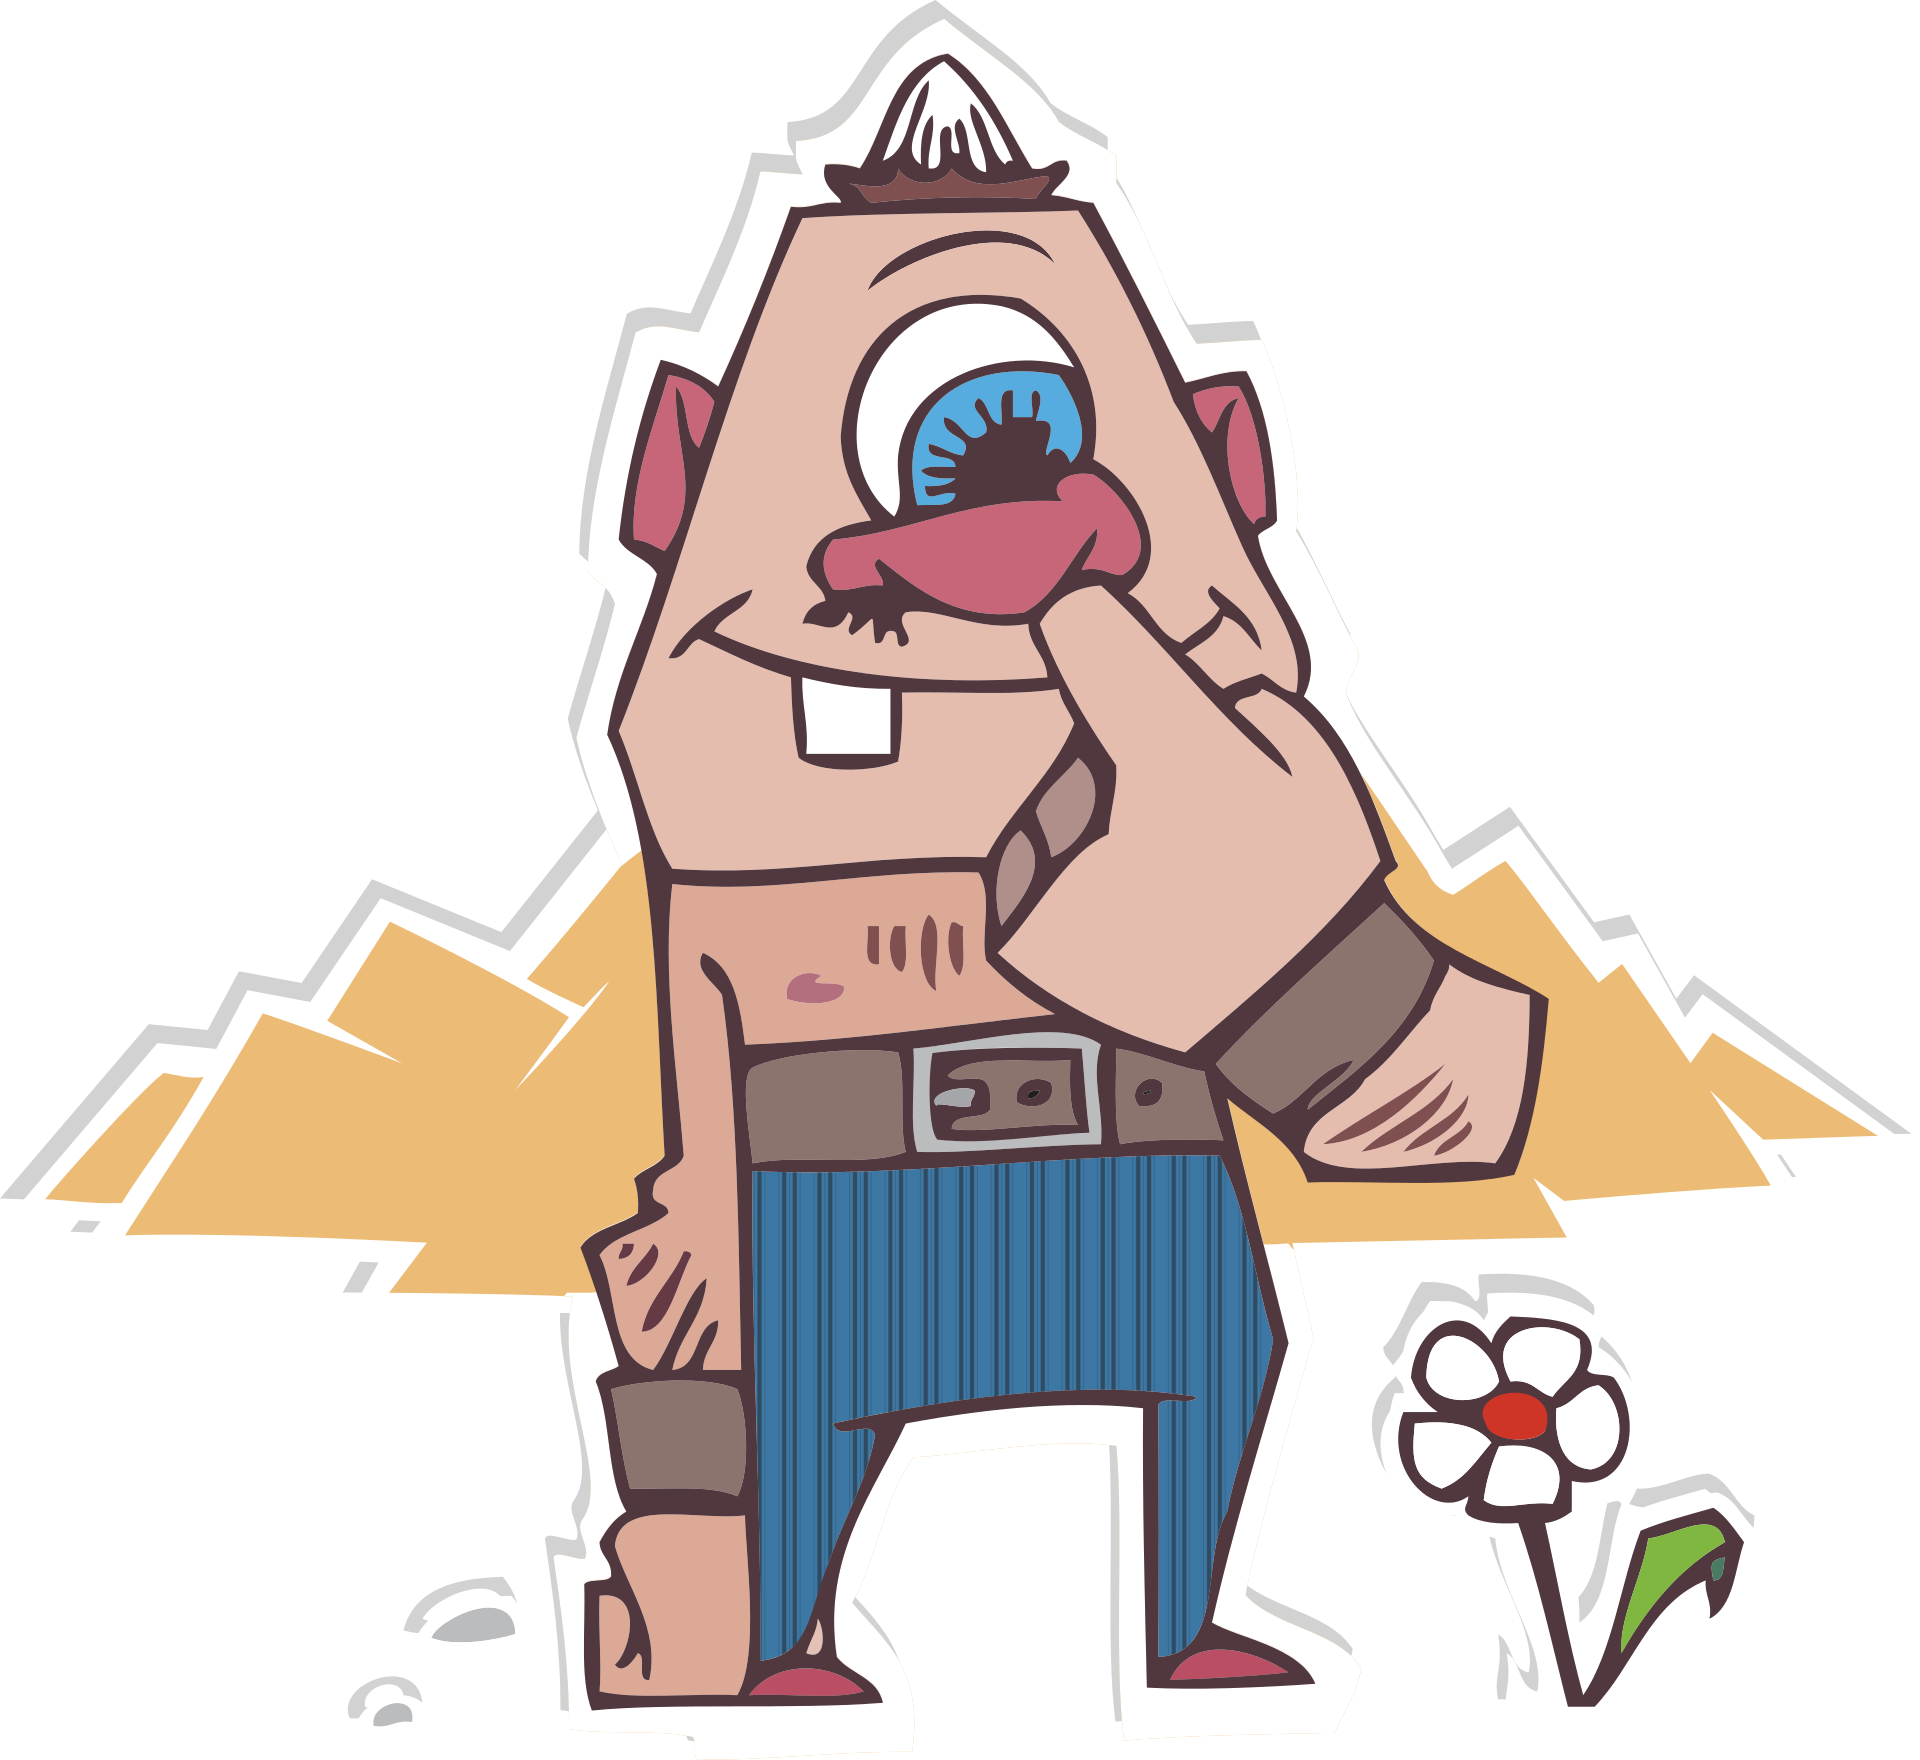 Монстр, развлечения, палец, нос, цветок - Обои HD - Профессор falken.com